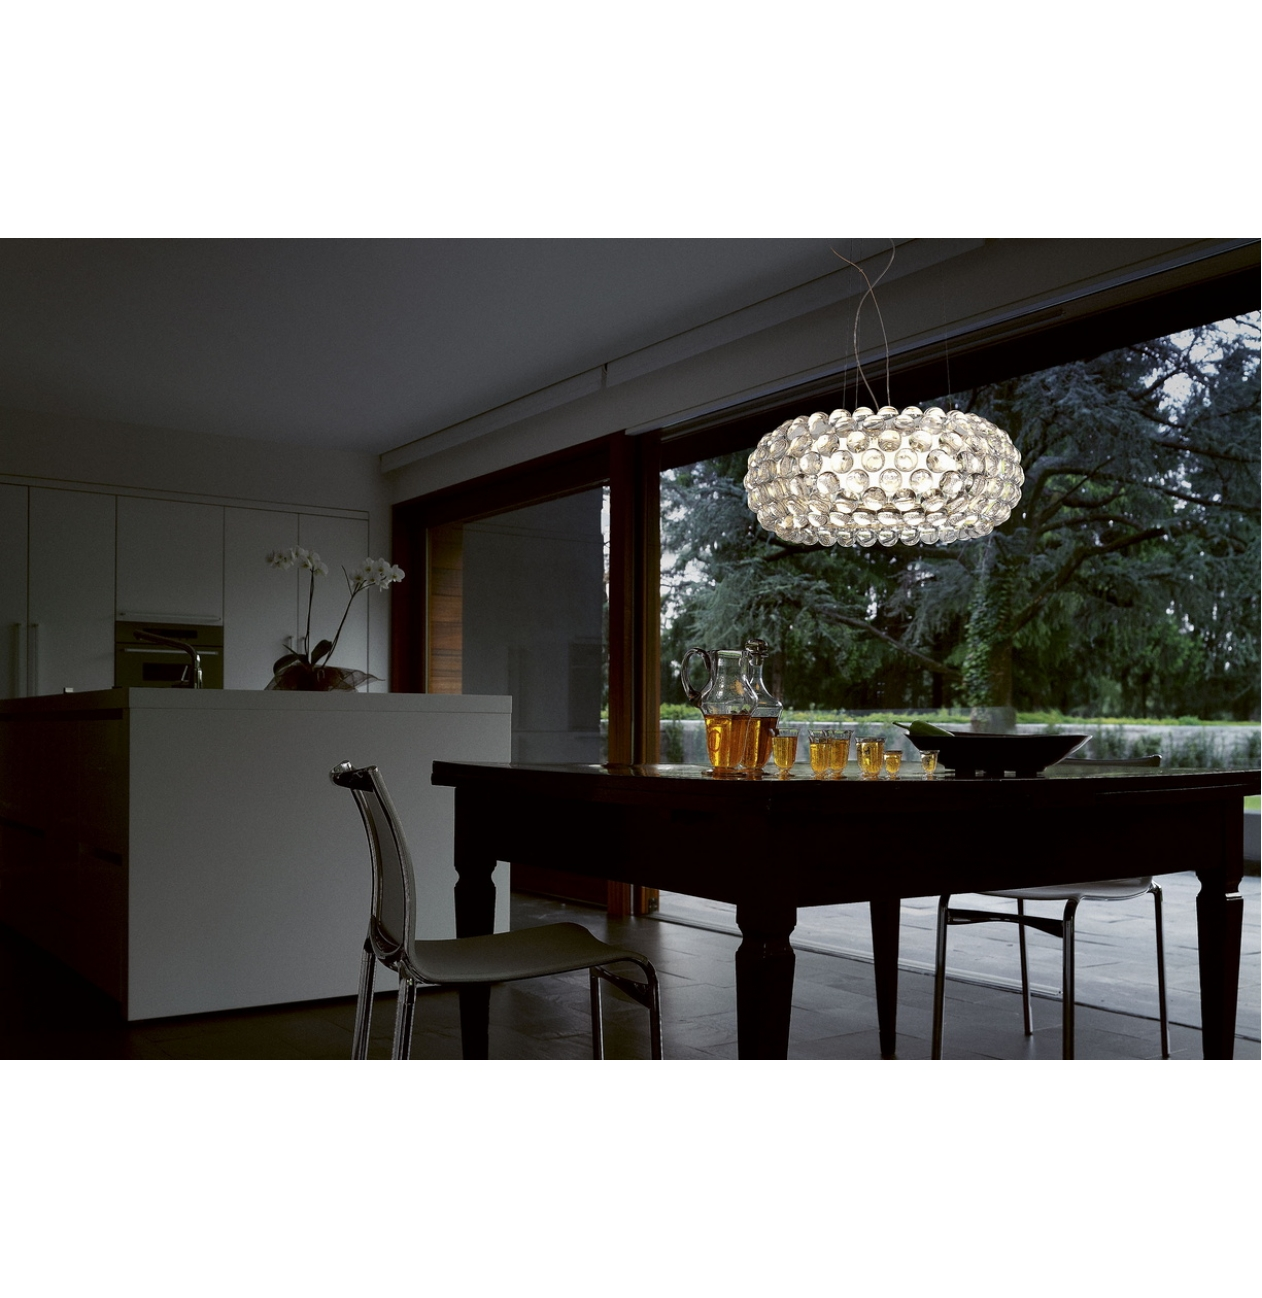 foscarini hanglamp caboche versteeg lichtstudio. Black Bedroom Furniture Sets. Home Design Ideas